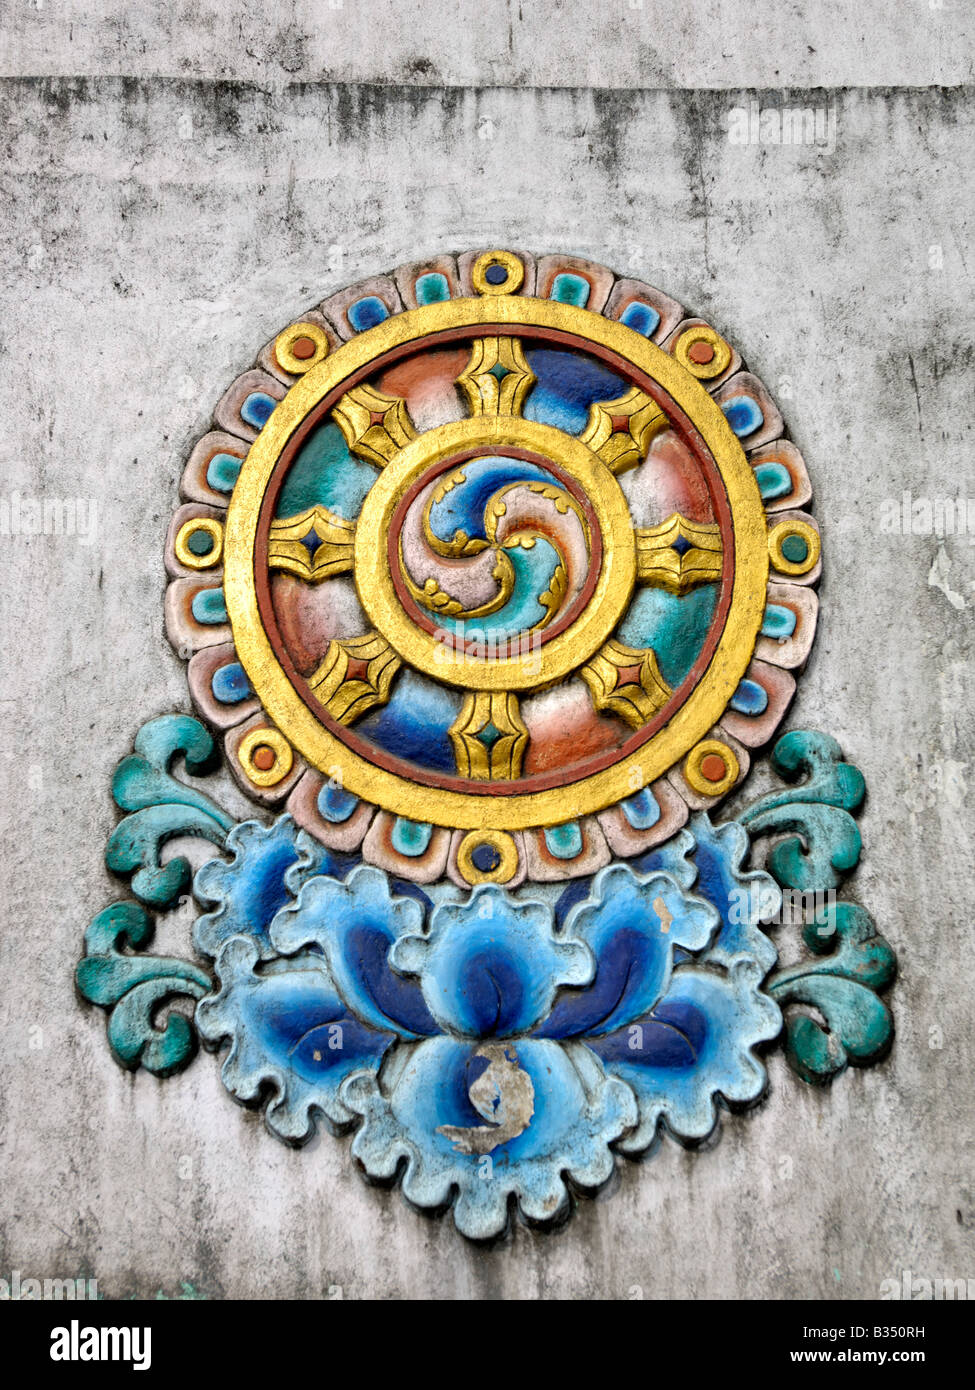 Buddhist symbol stock photos buddhist symbol stock images alamy dharma chakra dharmachakra tibetan buddhist symbol stock image biocorpaavc Choice Image